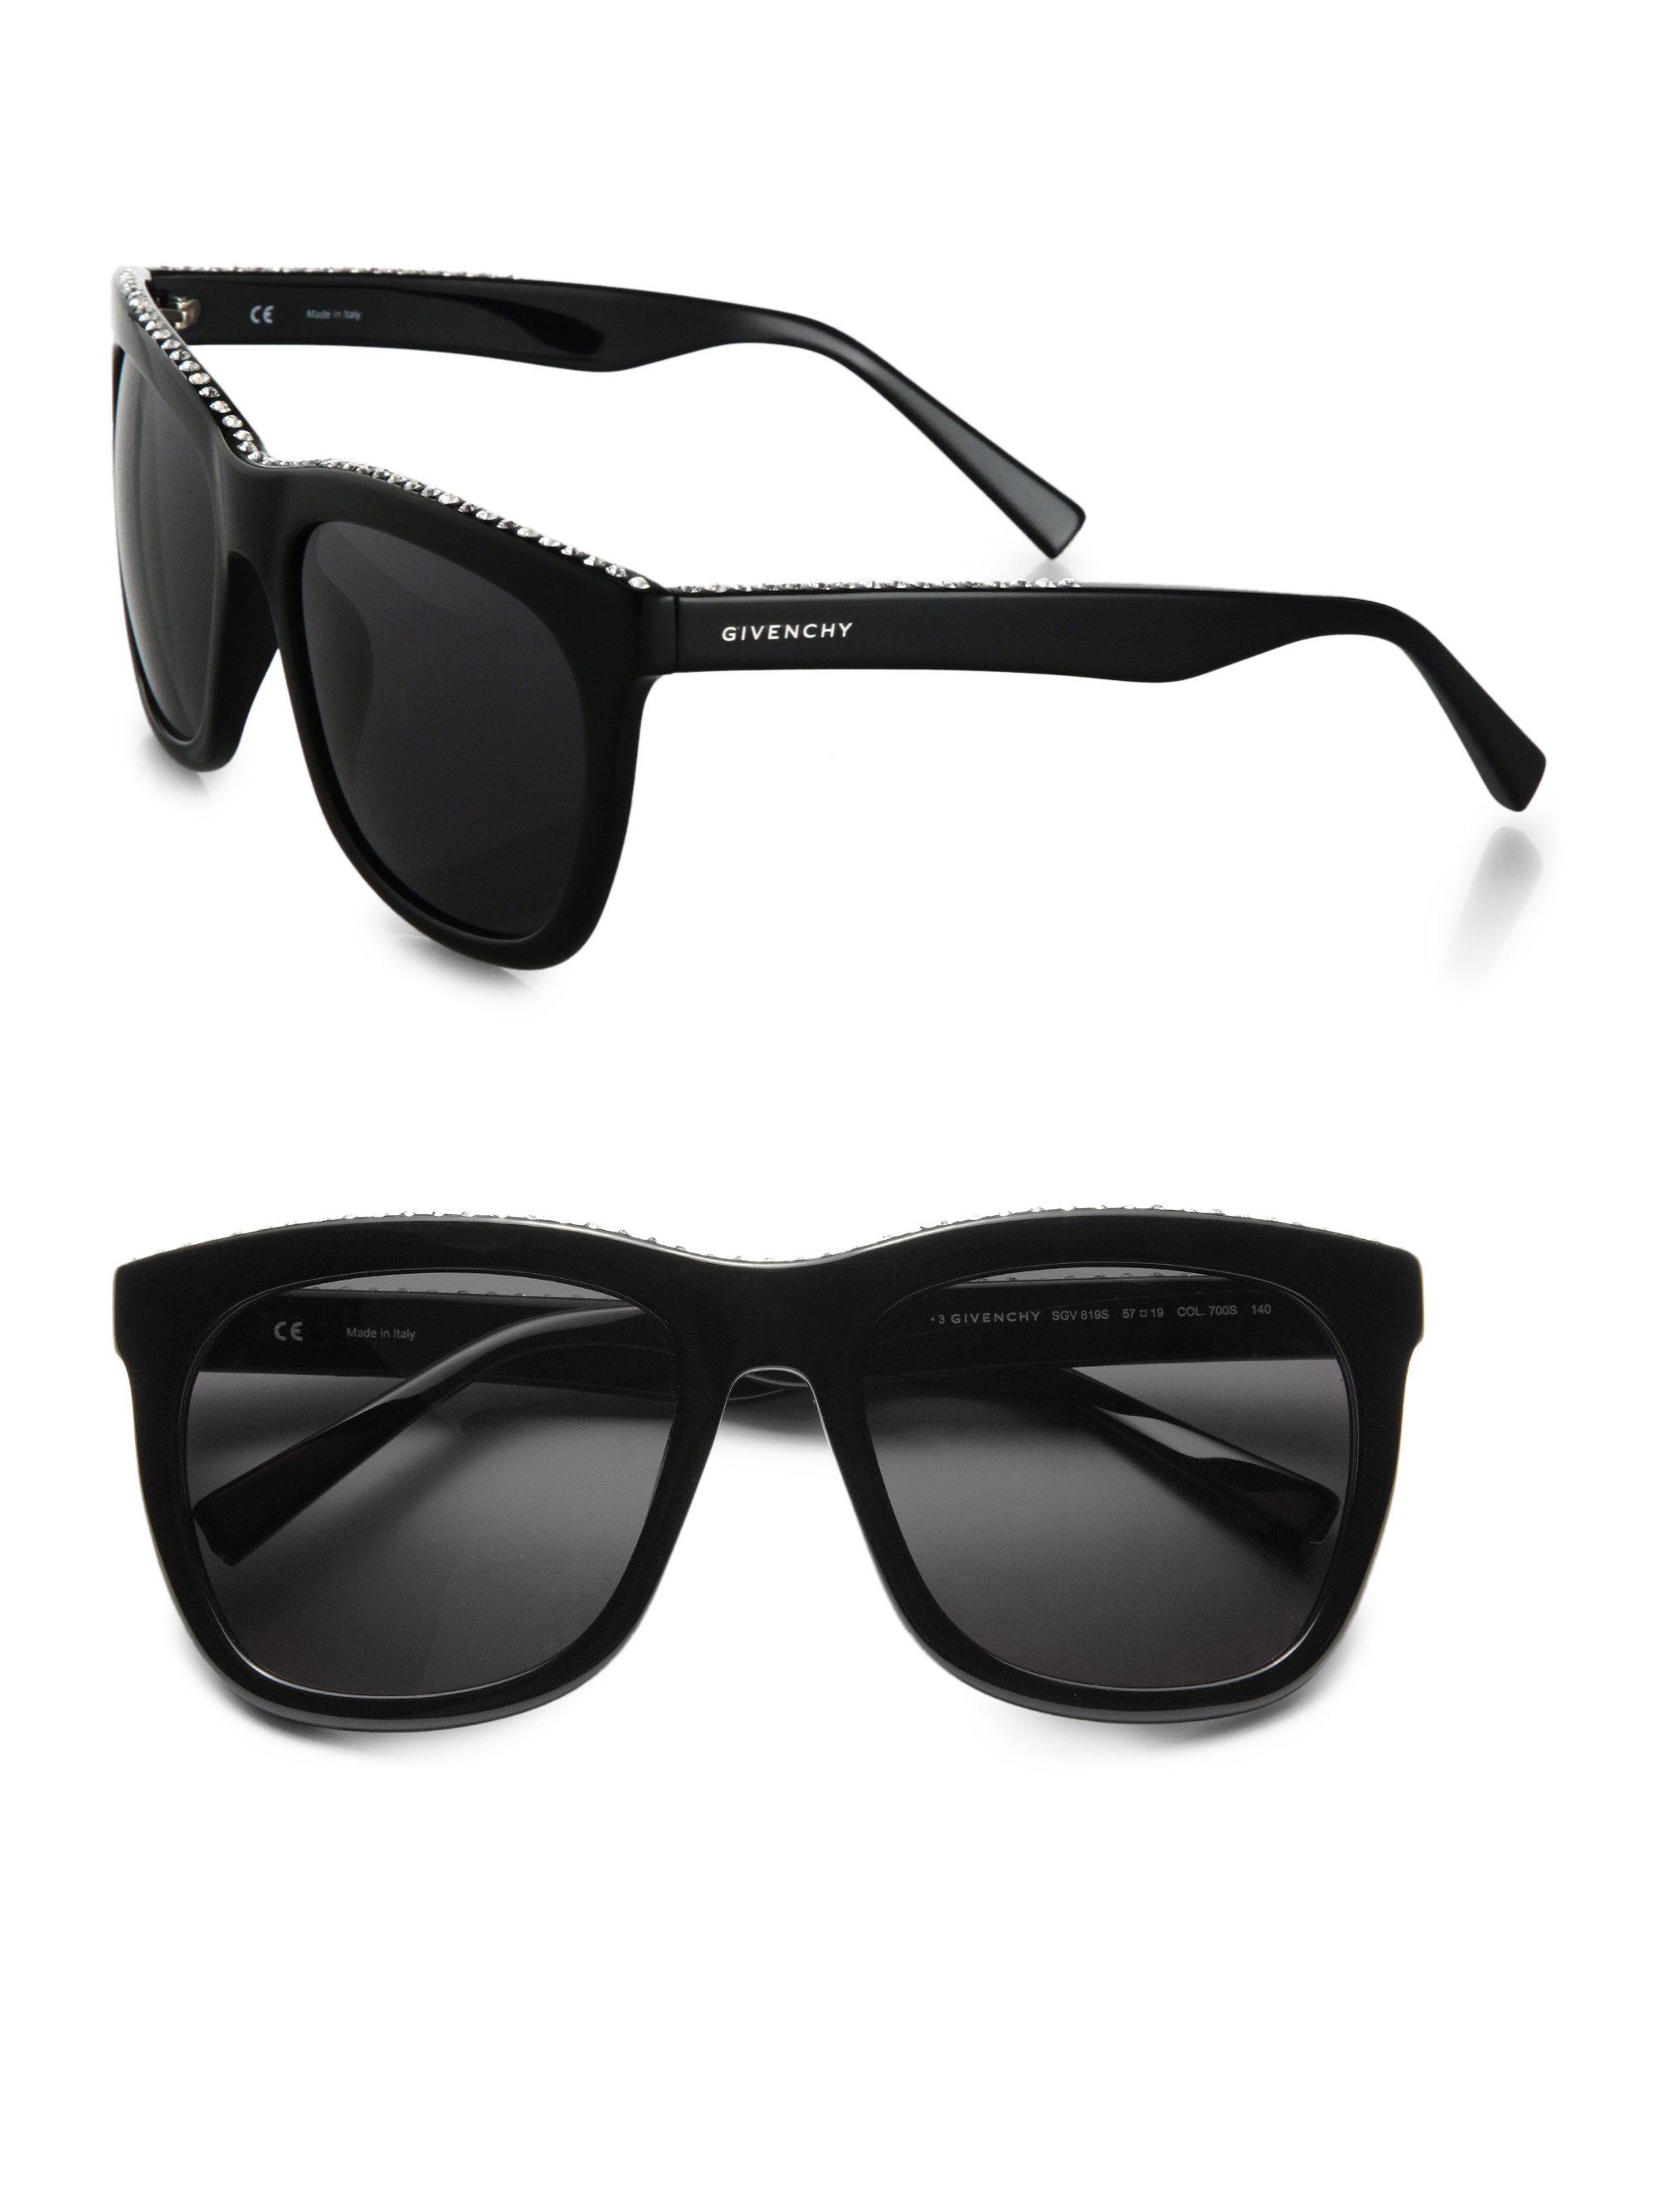 9000a98a5e Givenchy Swarovski Crystal Studded Square Sunglasses in Black